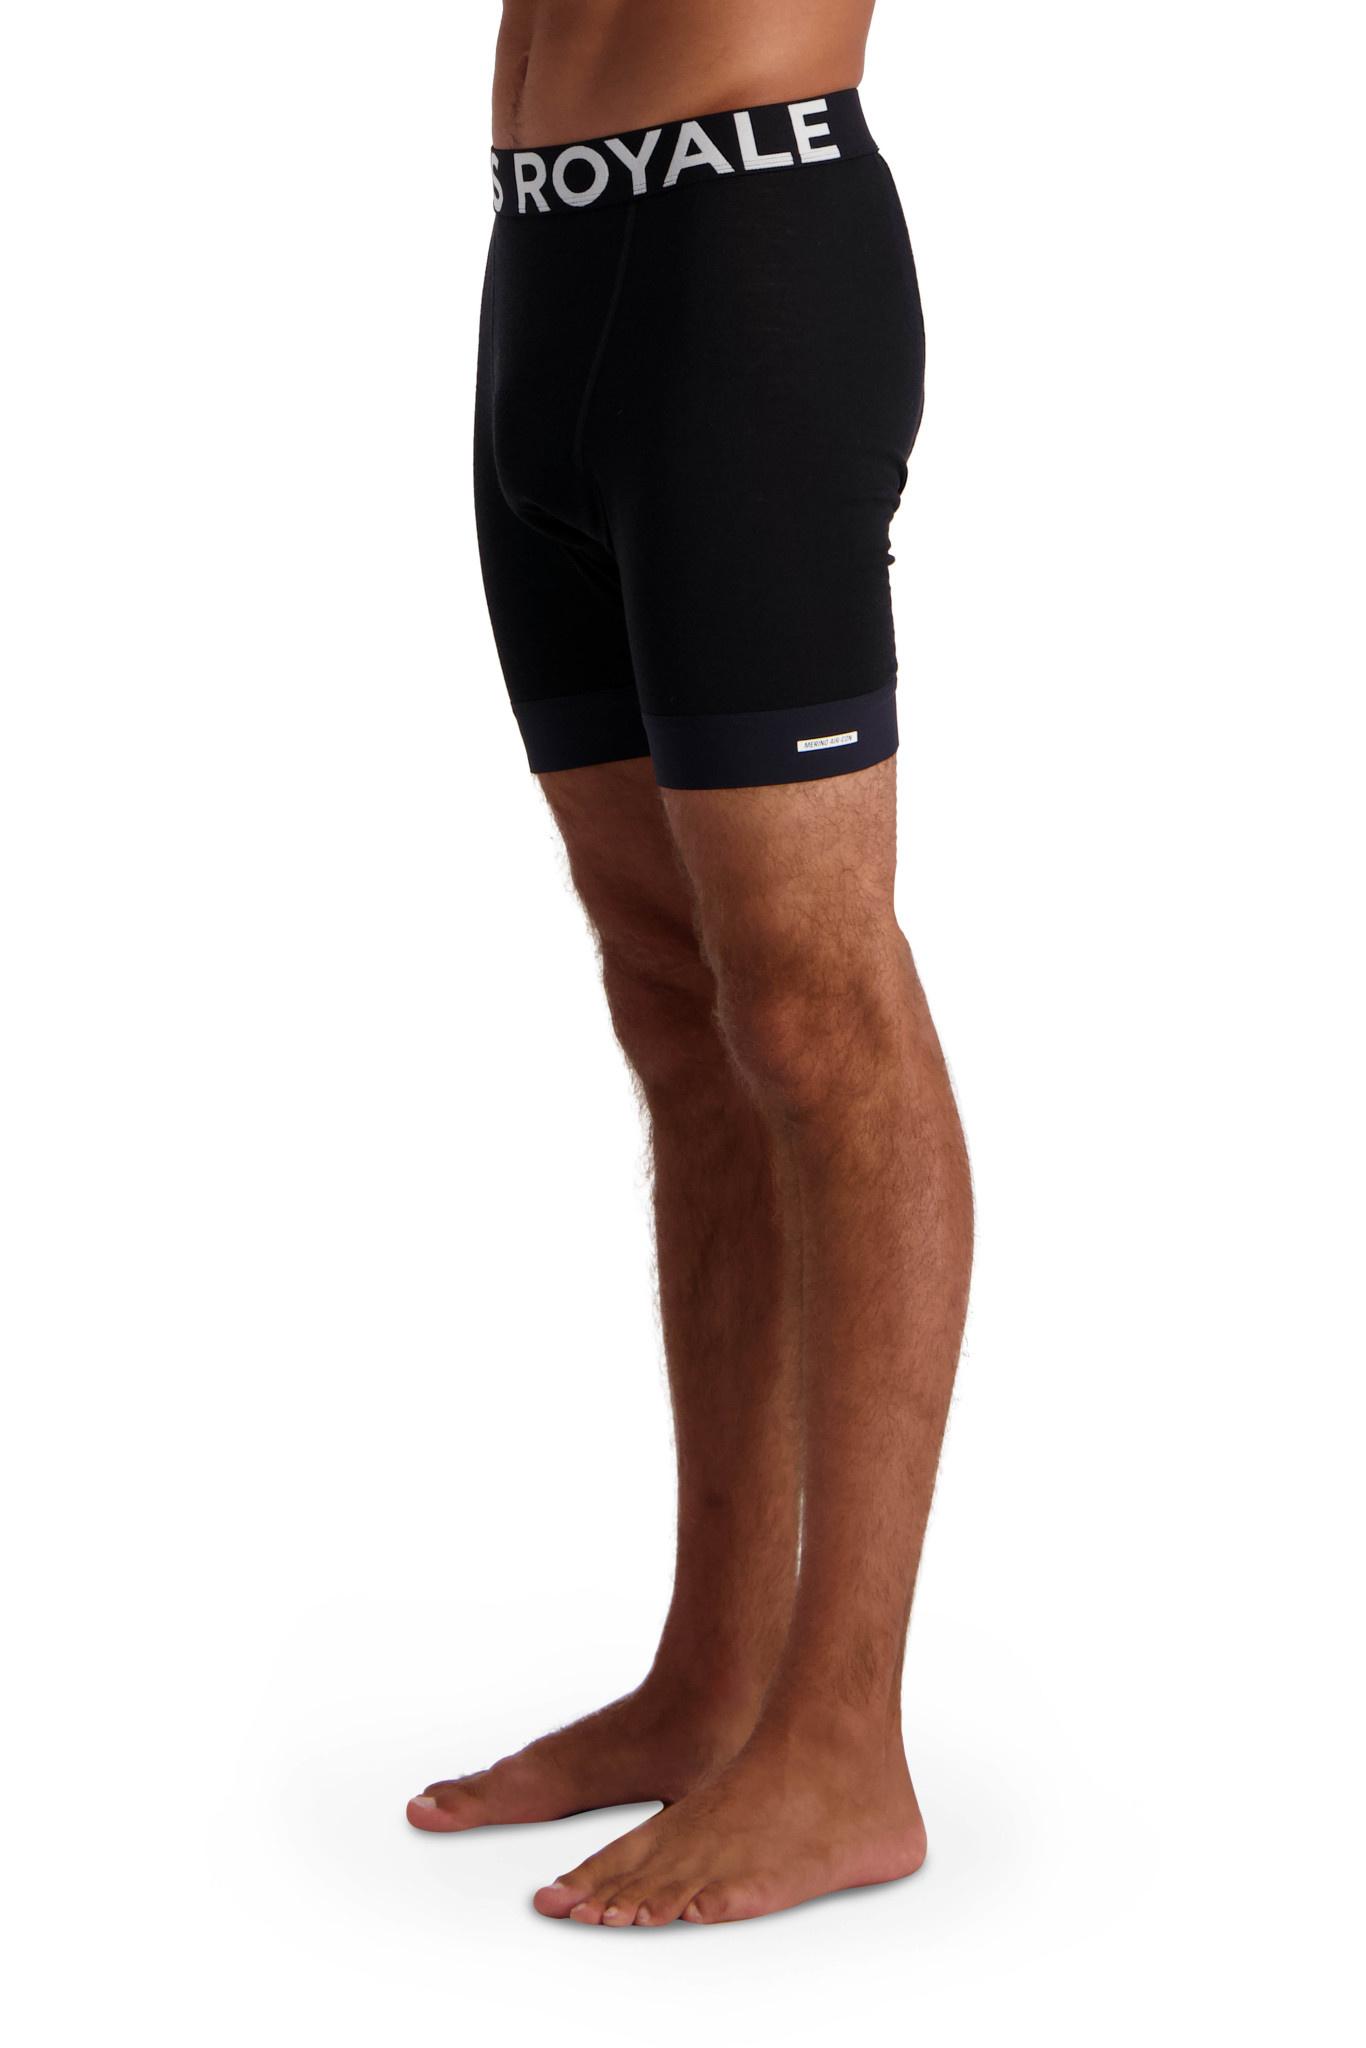 MONS ROYALE Mons Royale Men's Enduro Bike Short Liner